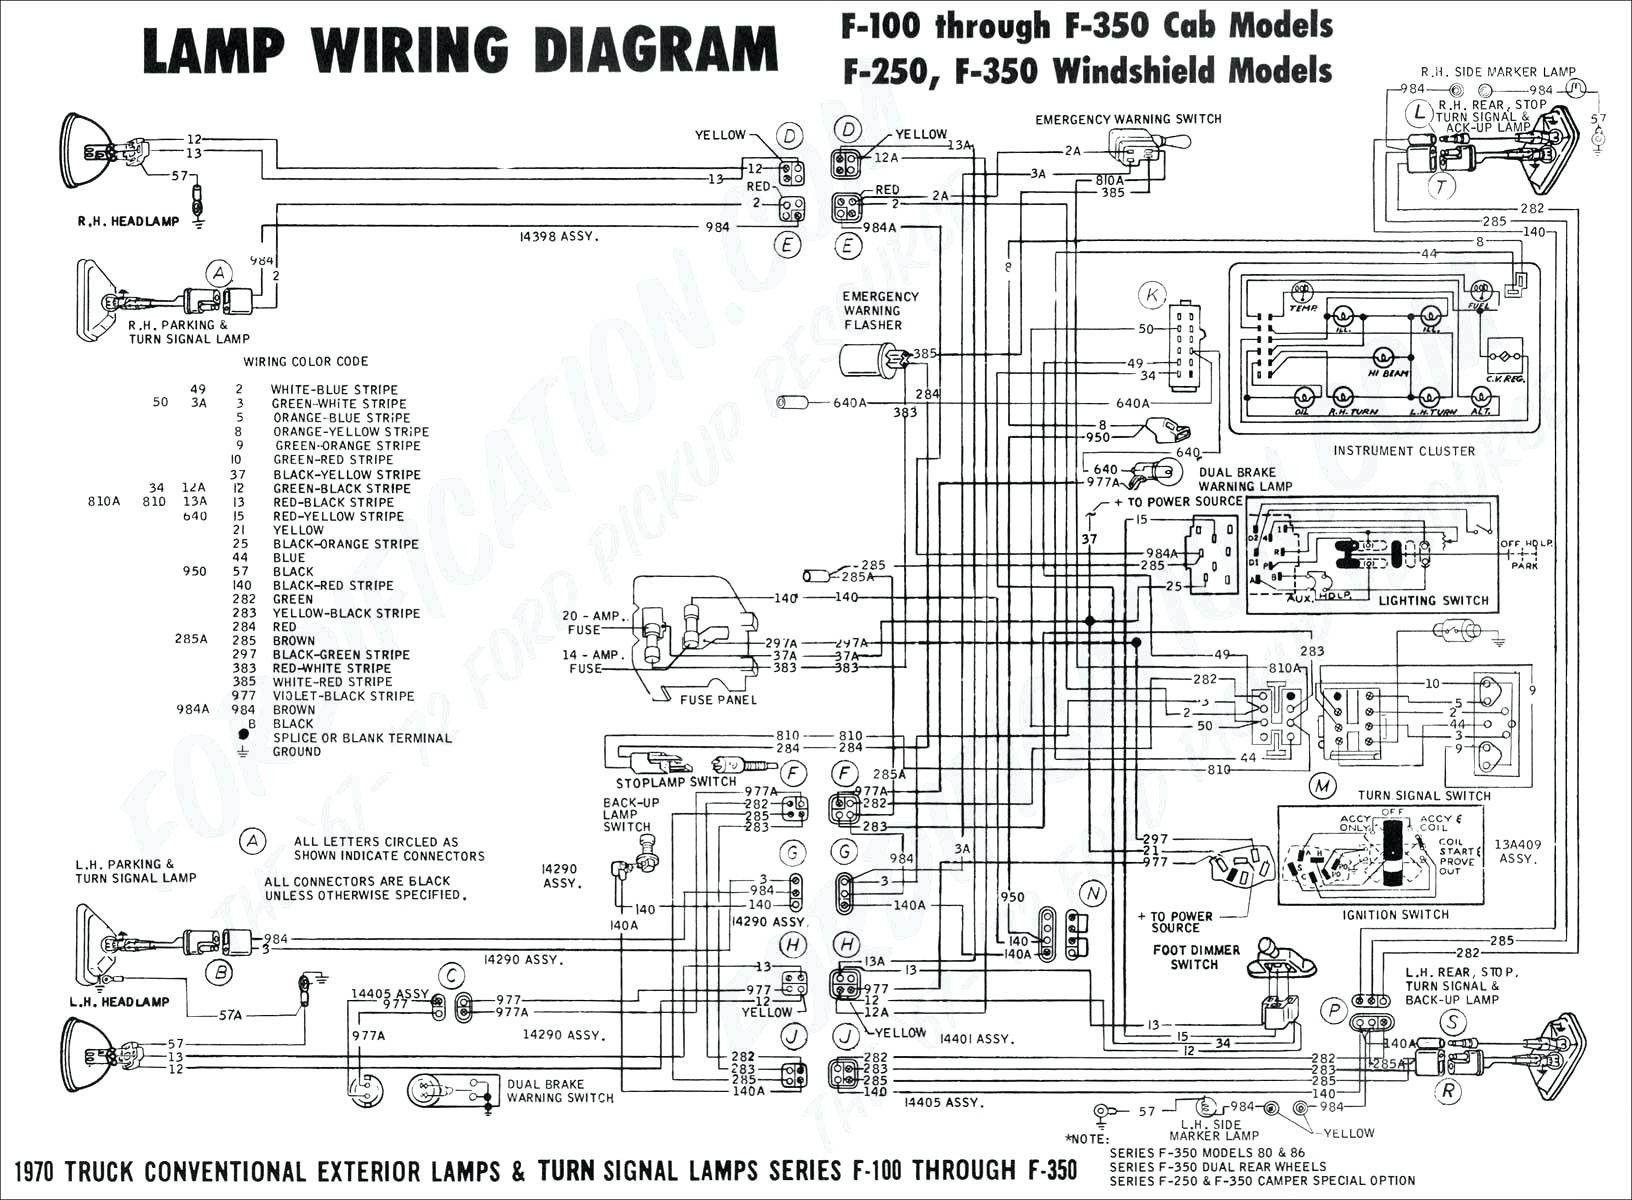 Elegant Rockford Fosgate P2 Wiring Diagram In 2020 Trailer Wiring Diagram Electrical Wiring Diagram Diagram